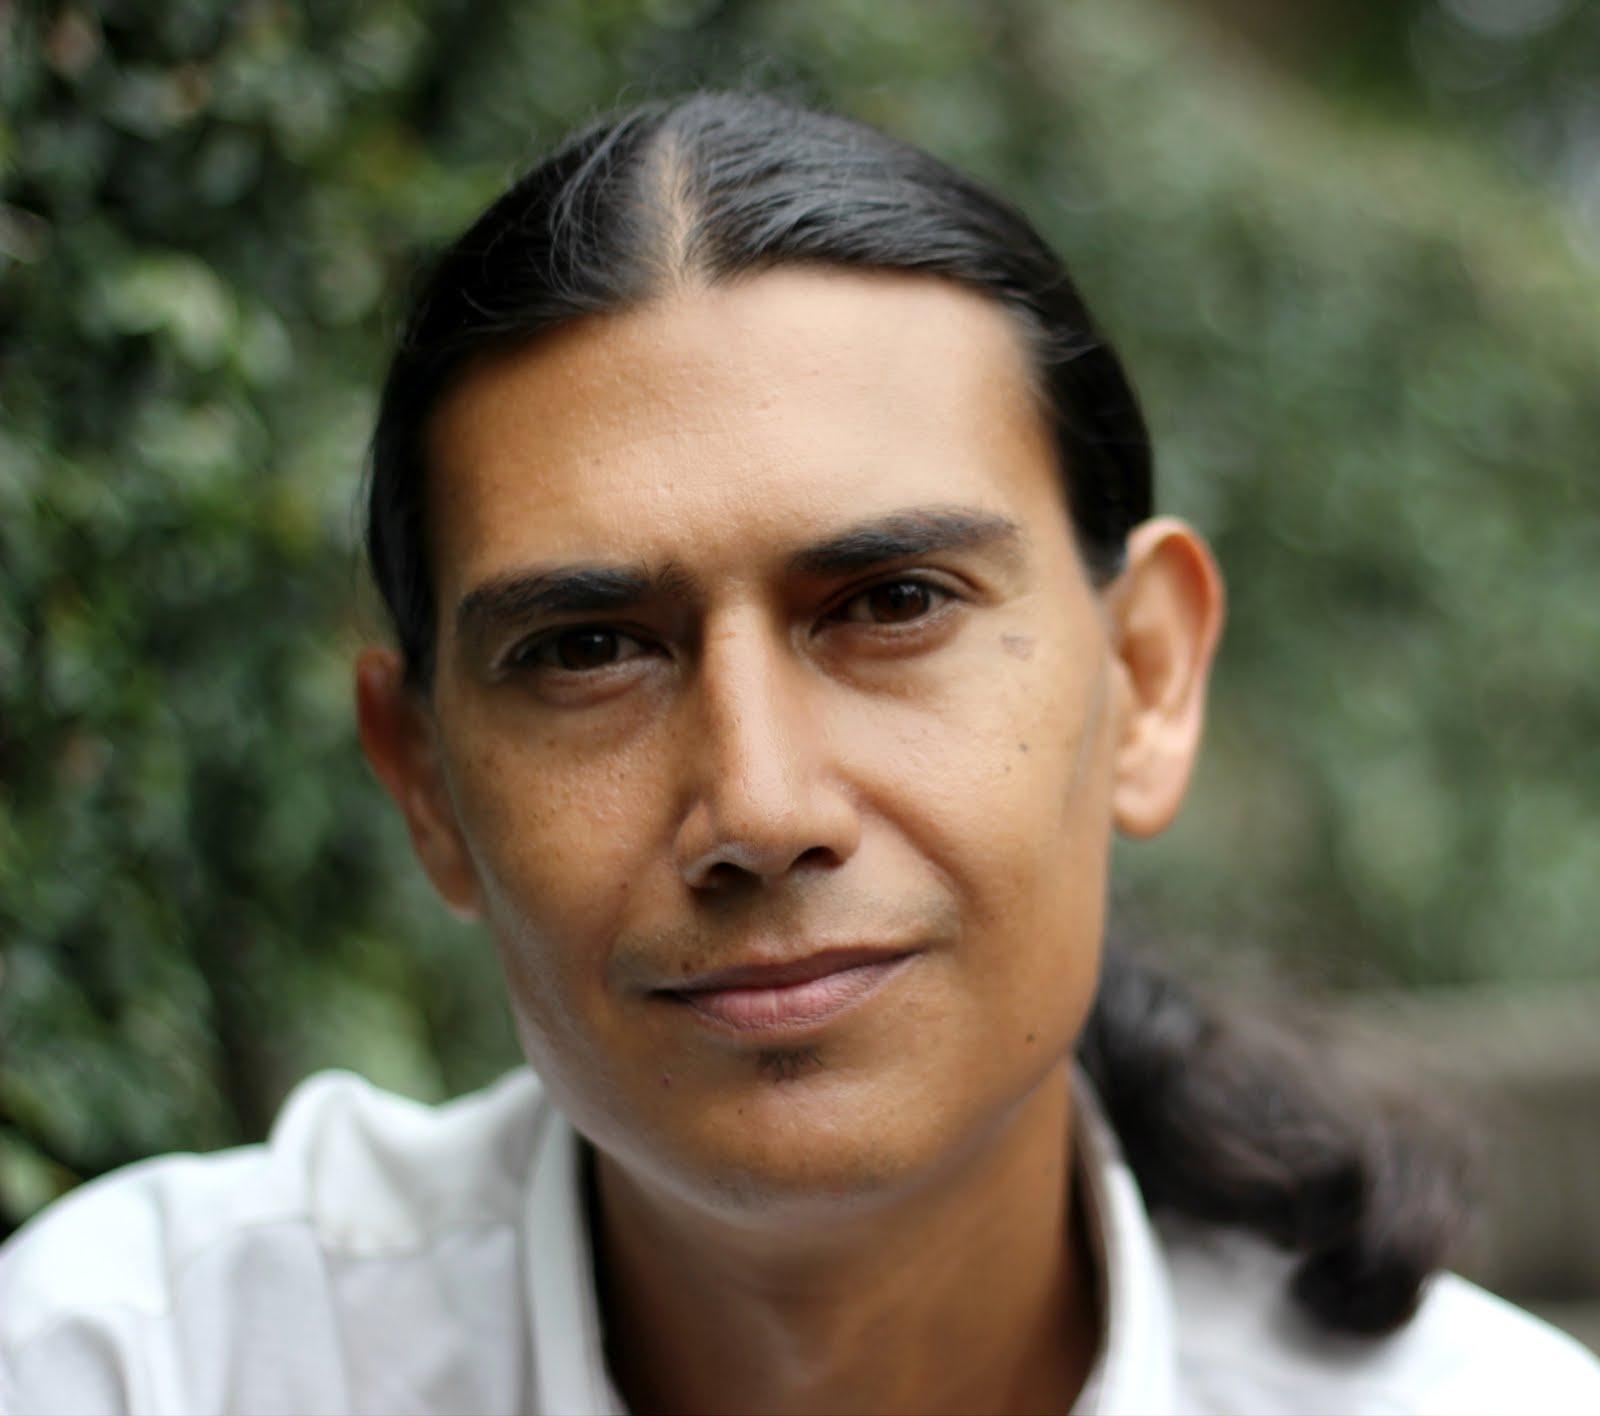 Germán Hernández